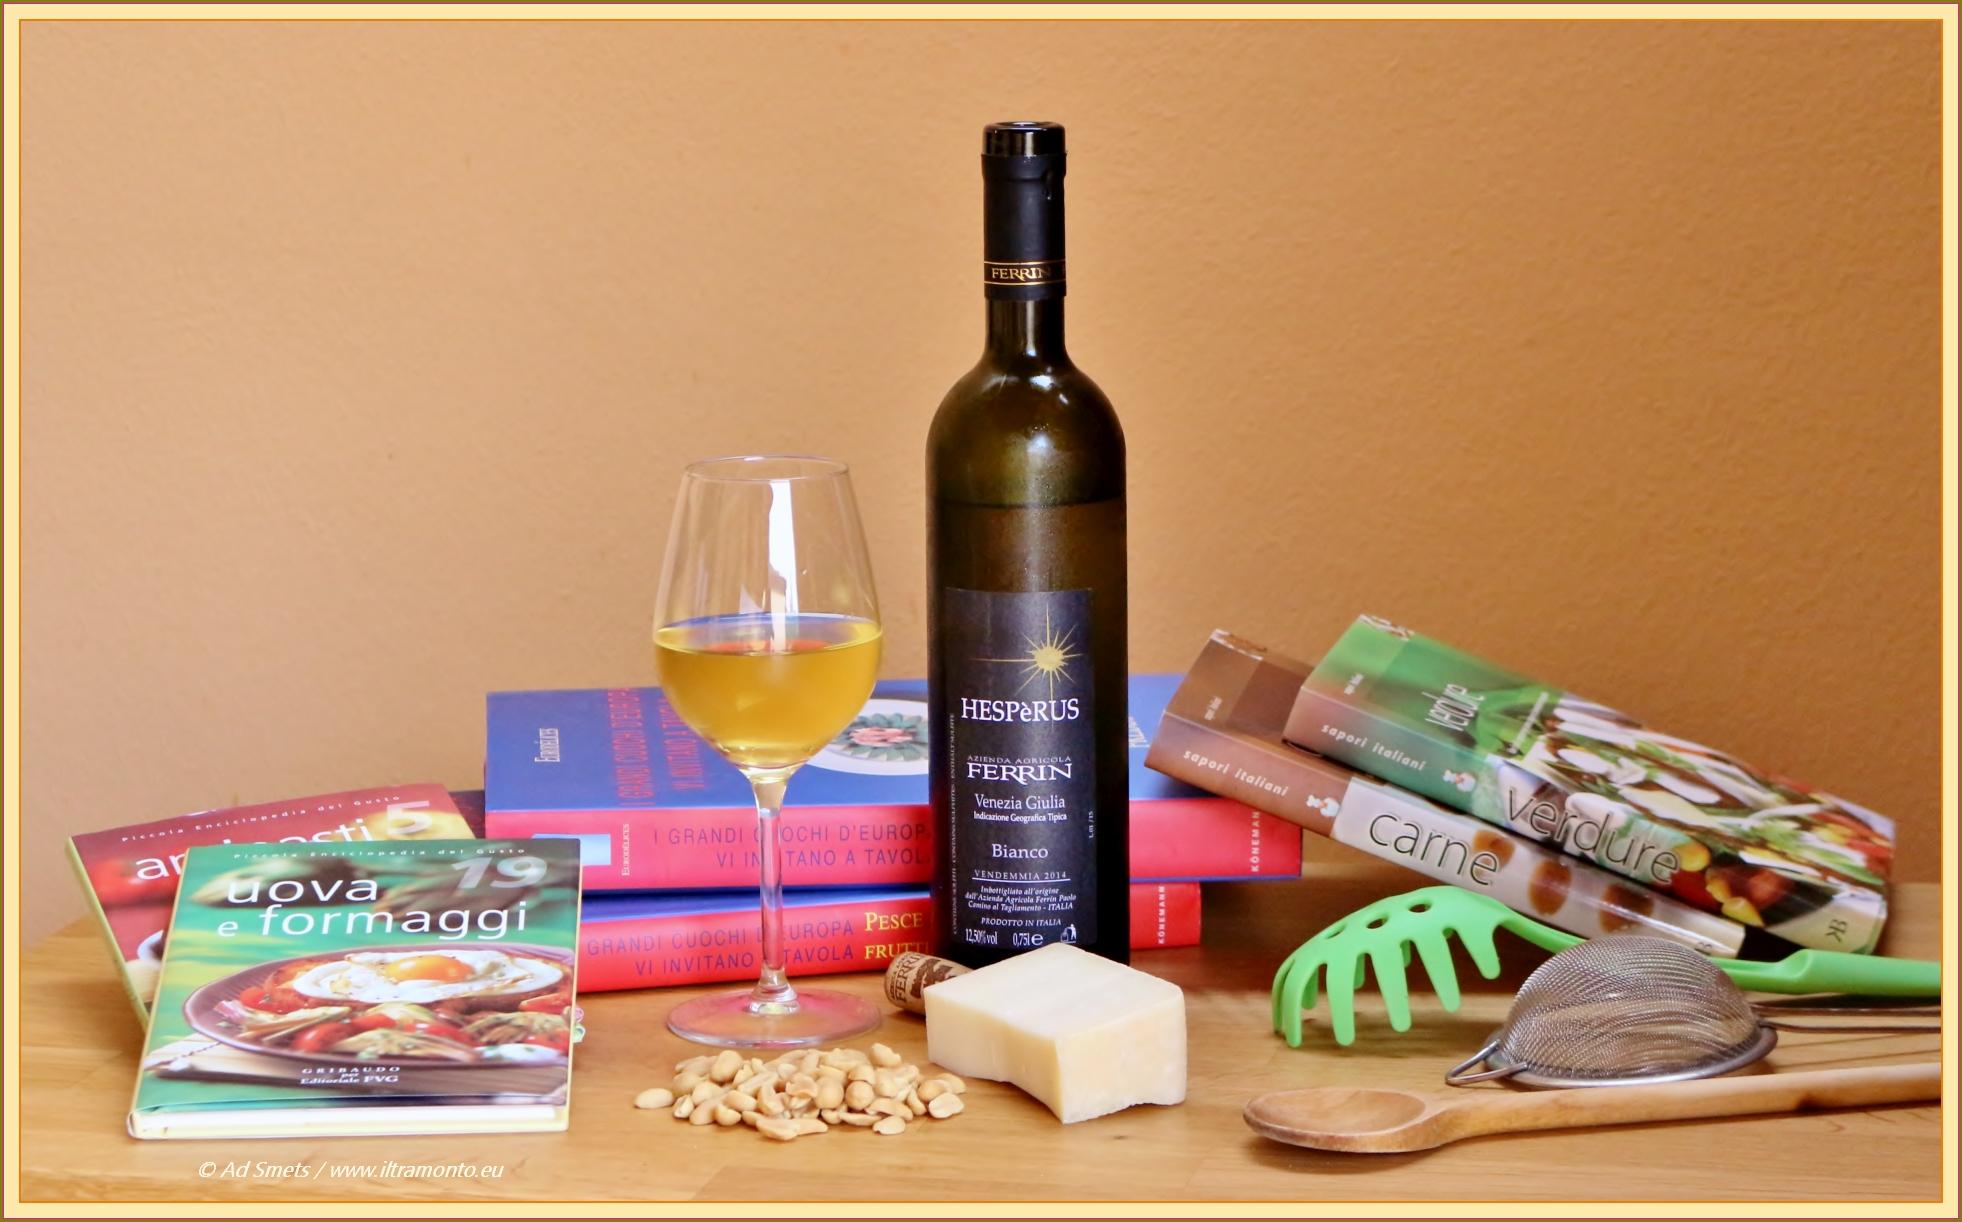 hersperus_0292_il-tramonto-wines